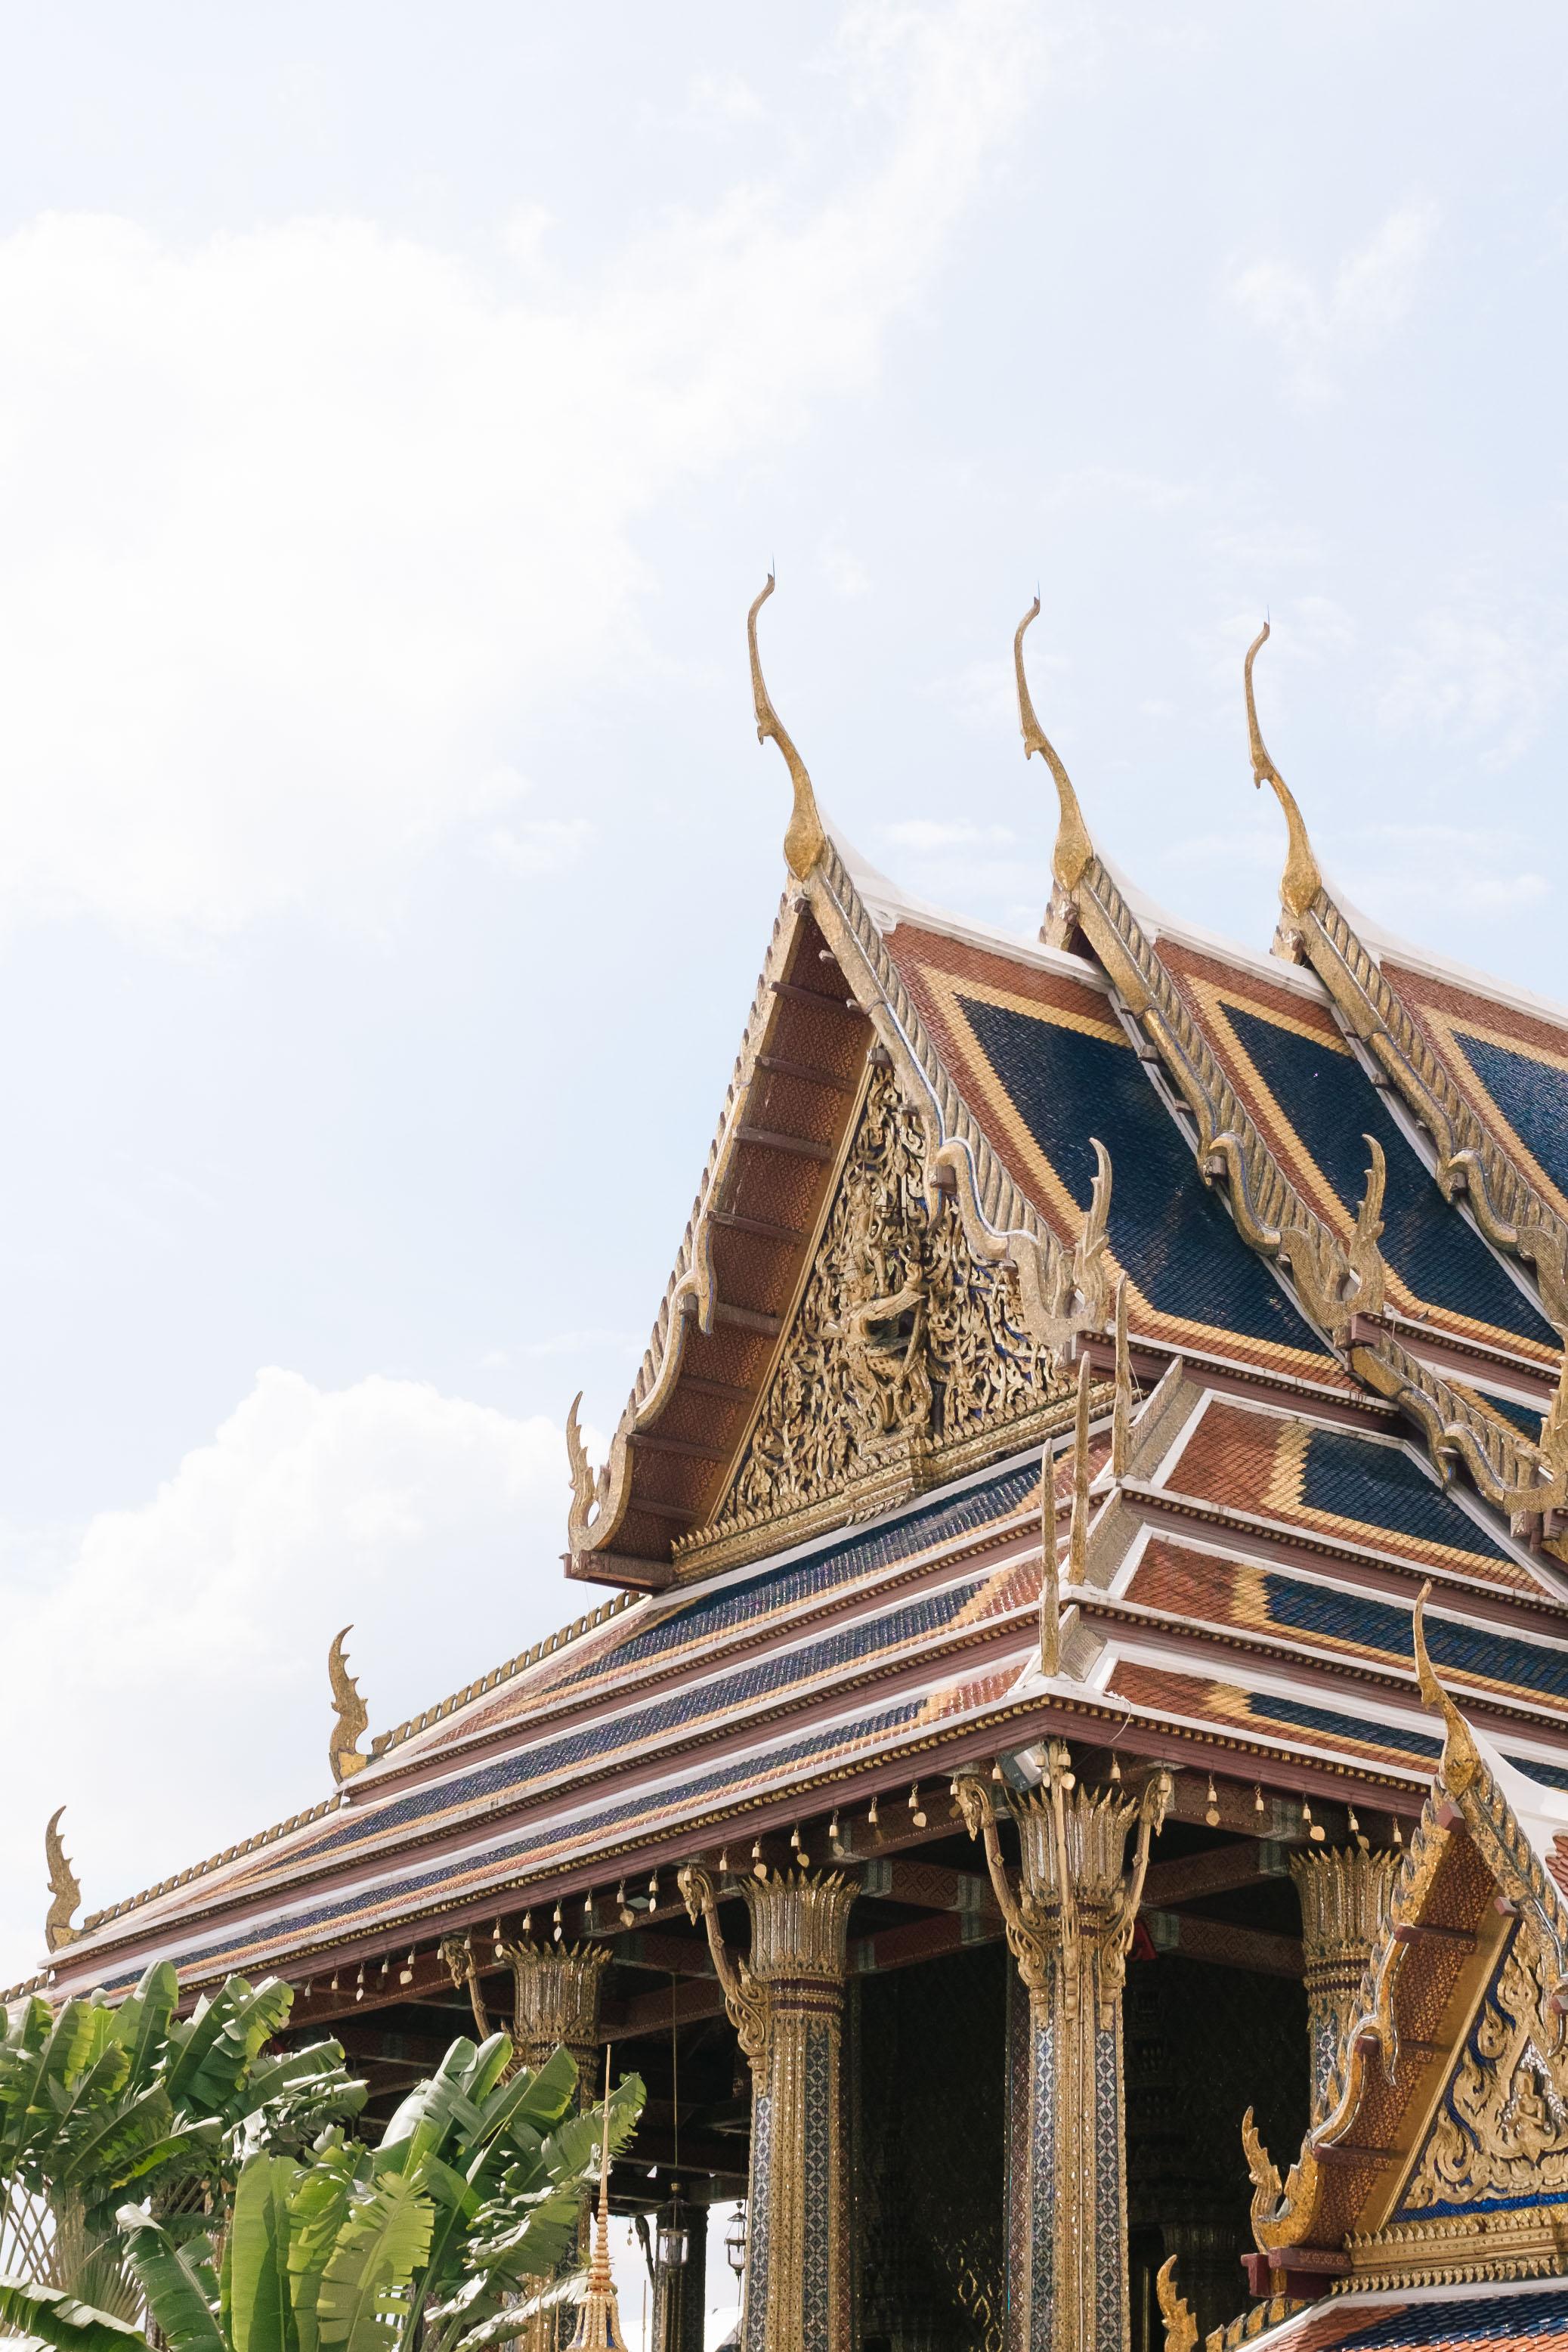 Grande Palace Building